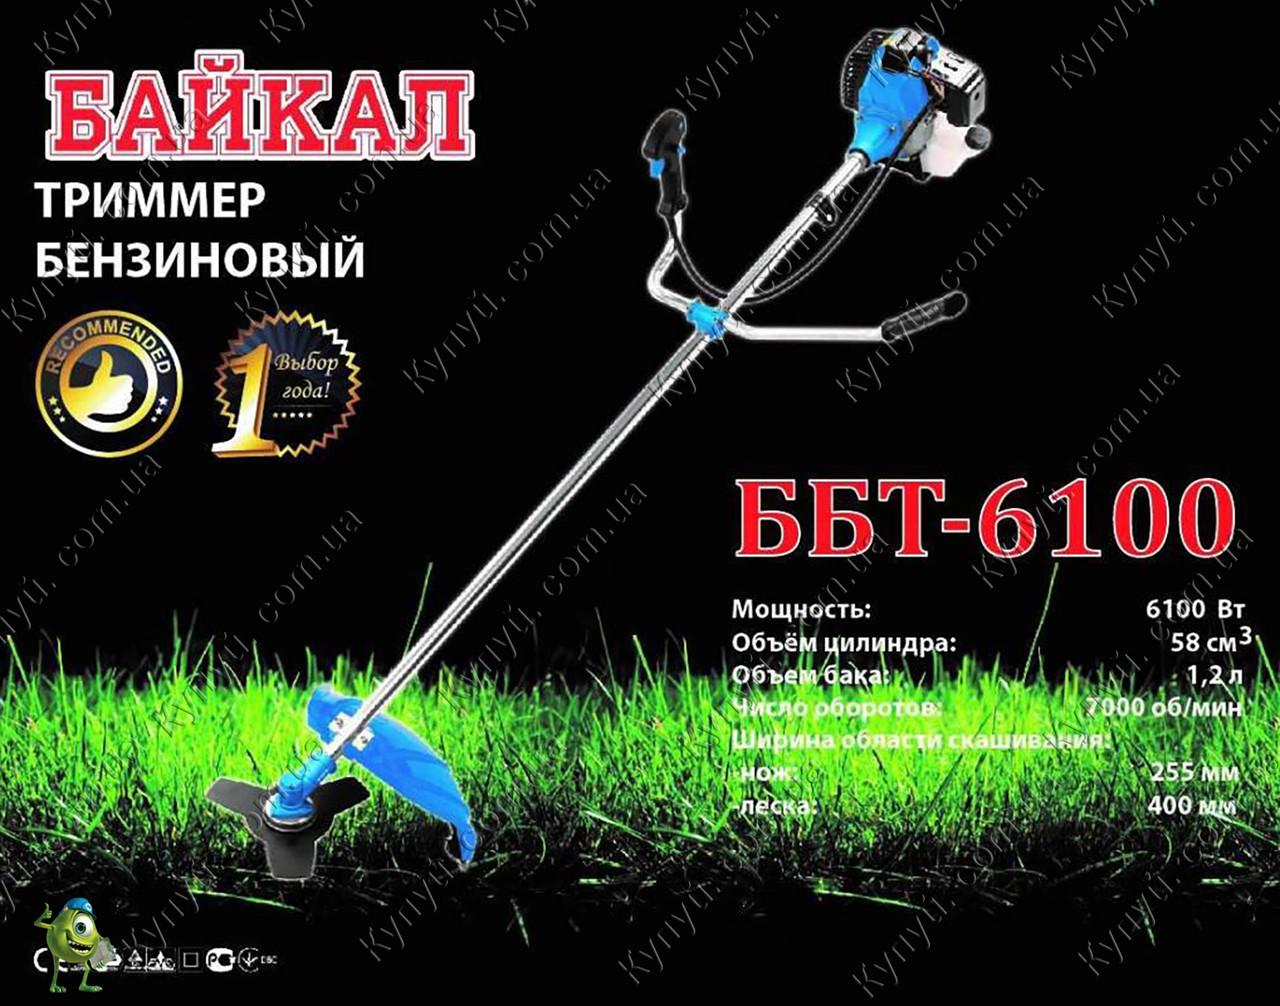 Мотокоса Байкал ББТ-6100 1 нож, 1 катушка